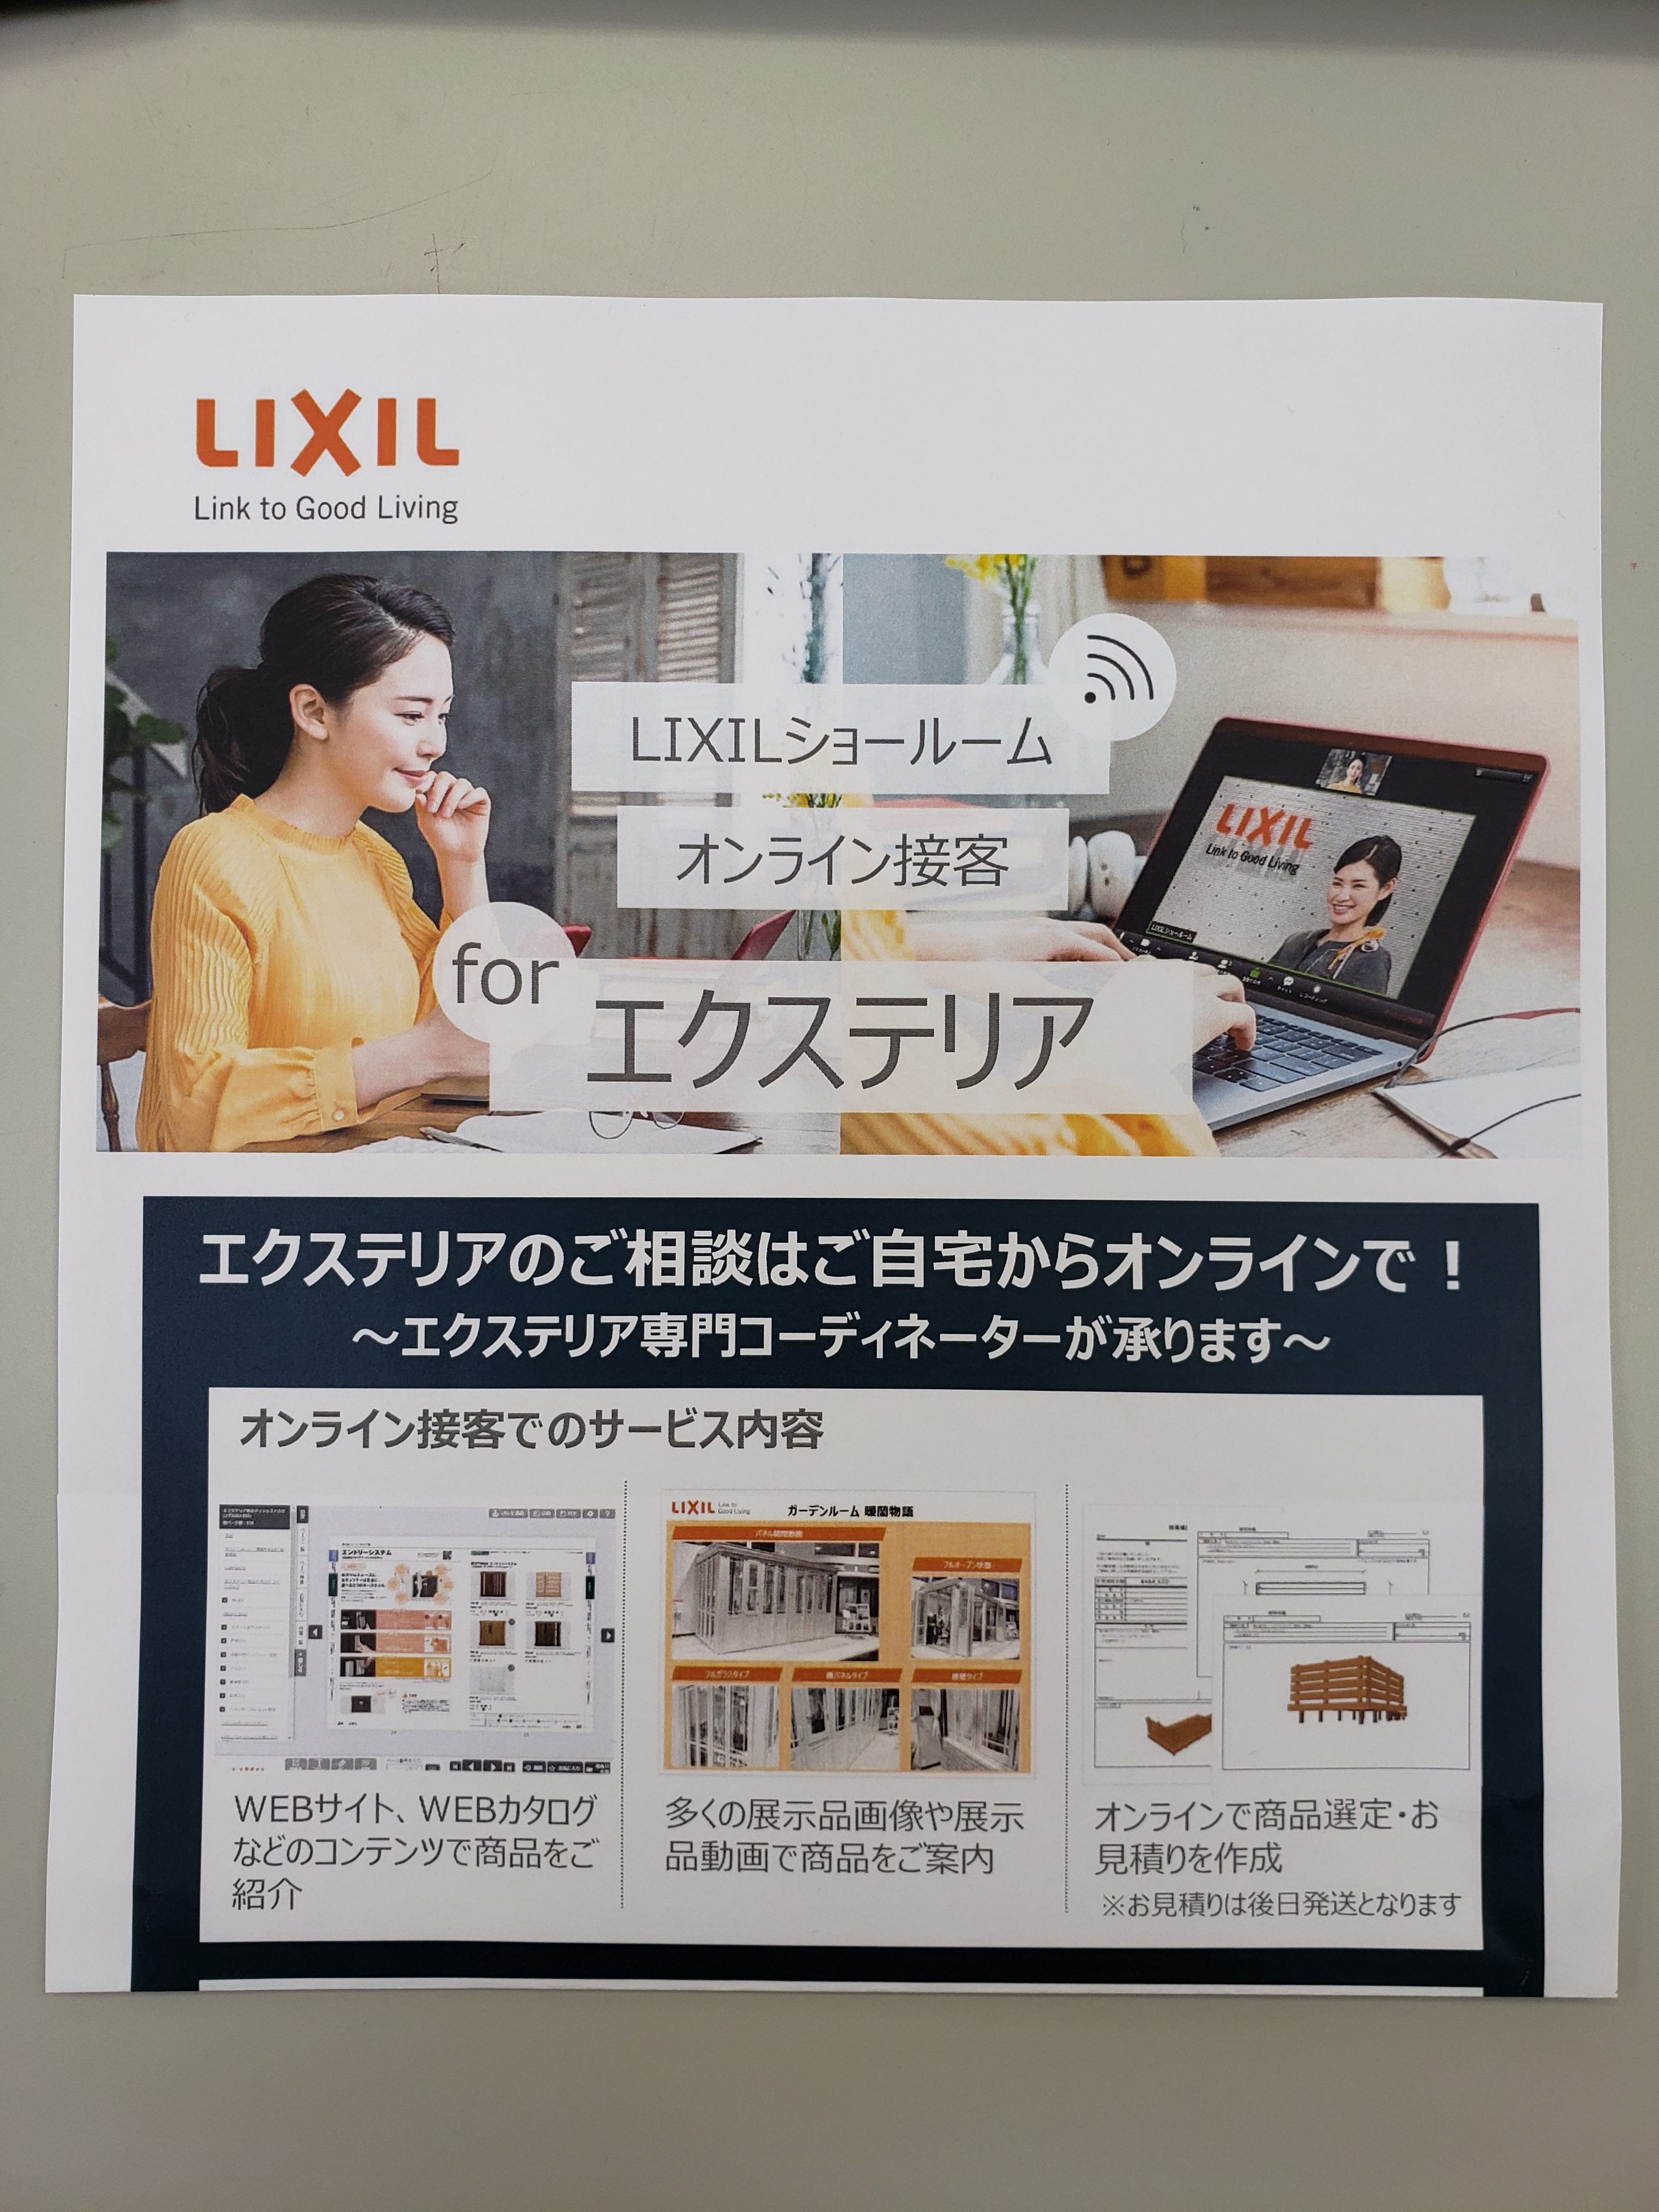 LIXIL エクステリア オンラインサービス ギャラリーパティオの現場ブログ メイン写真